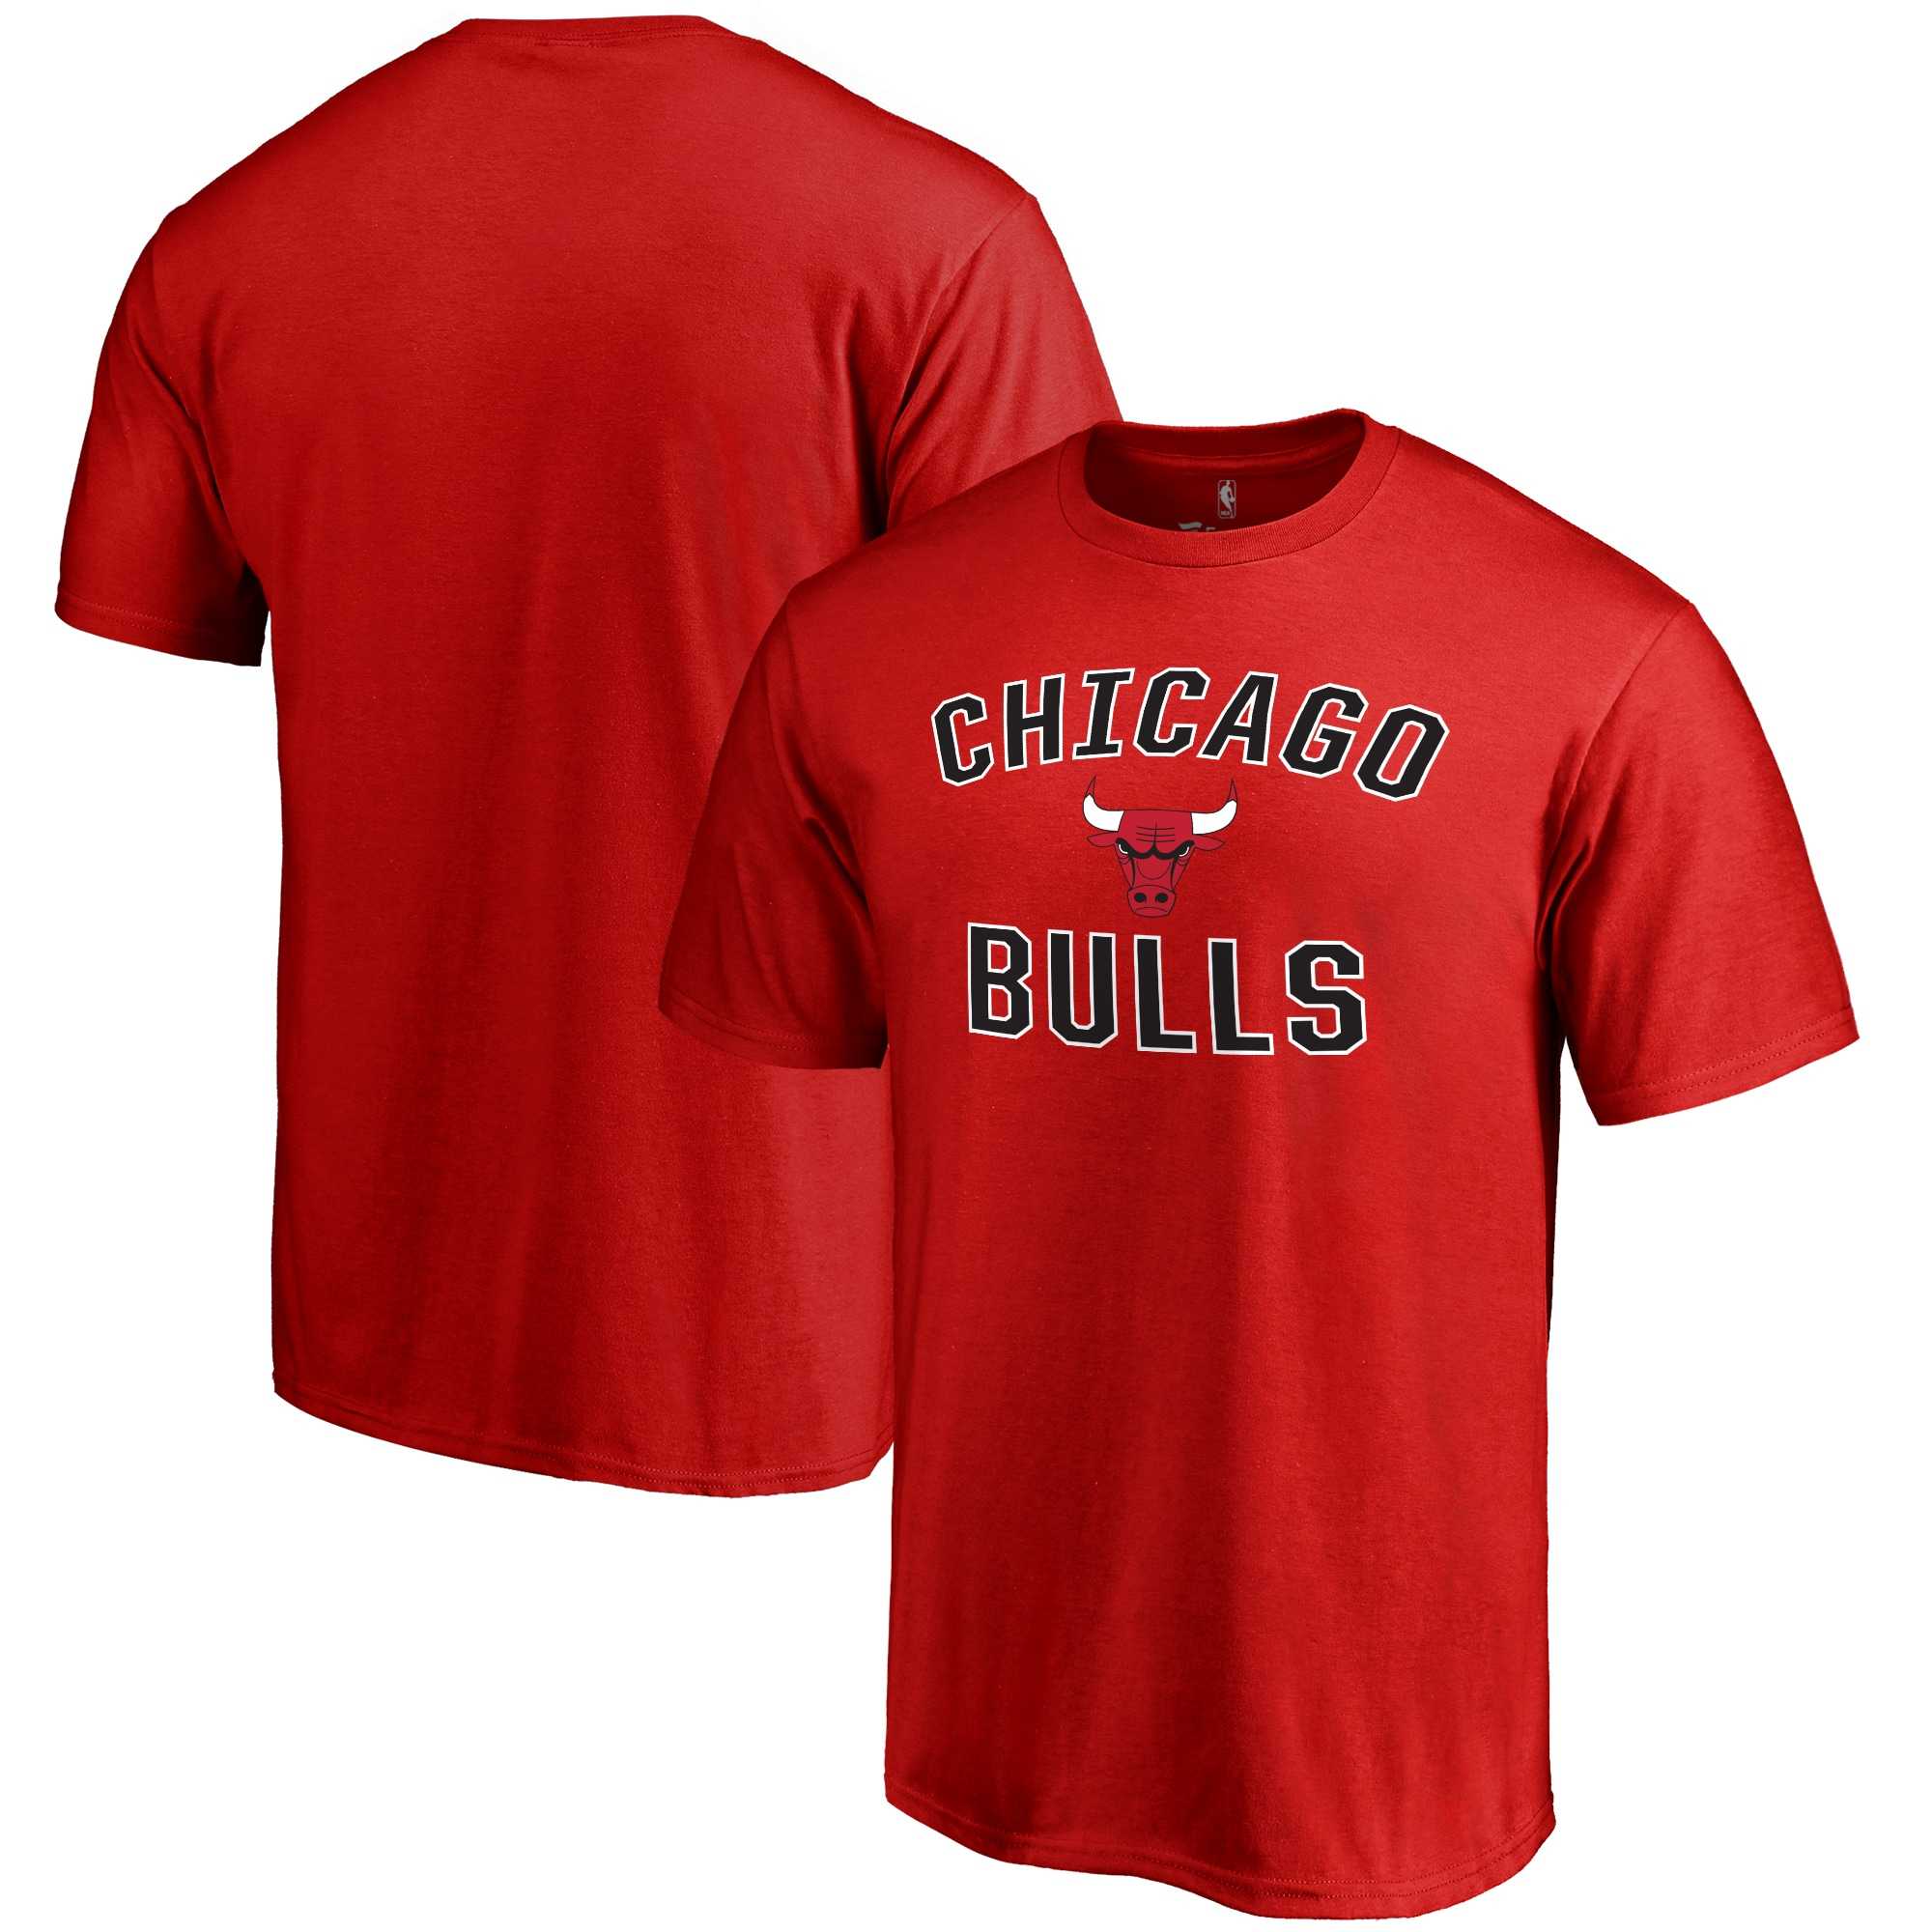 Chicago Bulls Big & Tall Victory Arch T-Shirt - Red